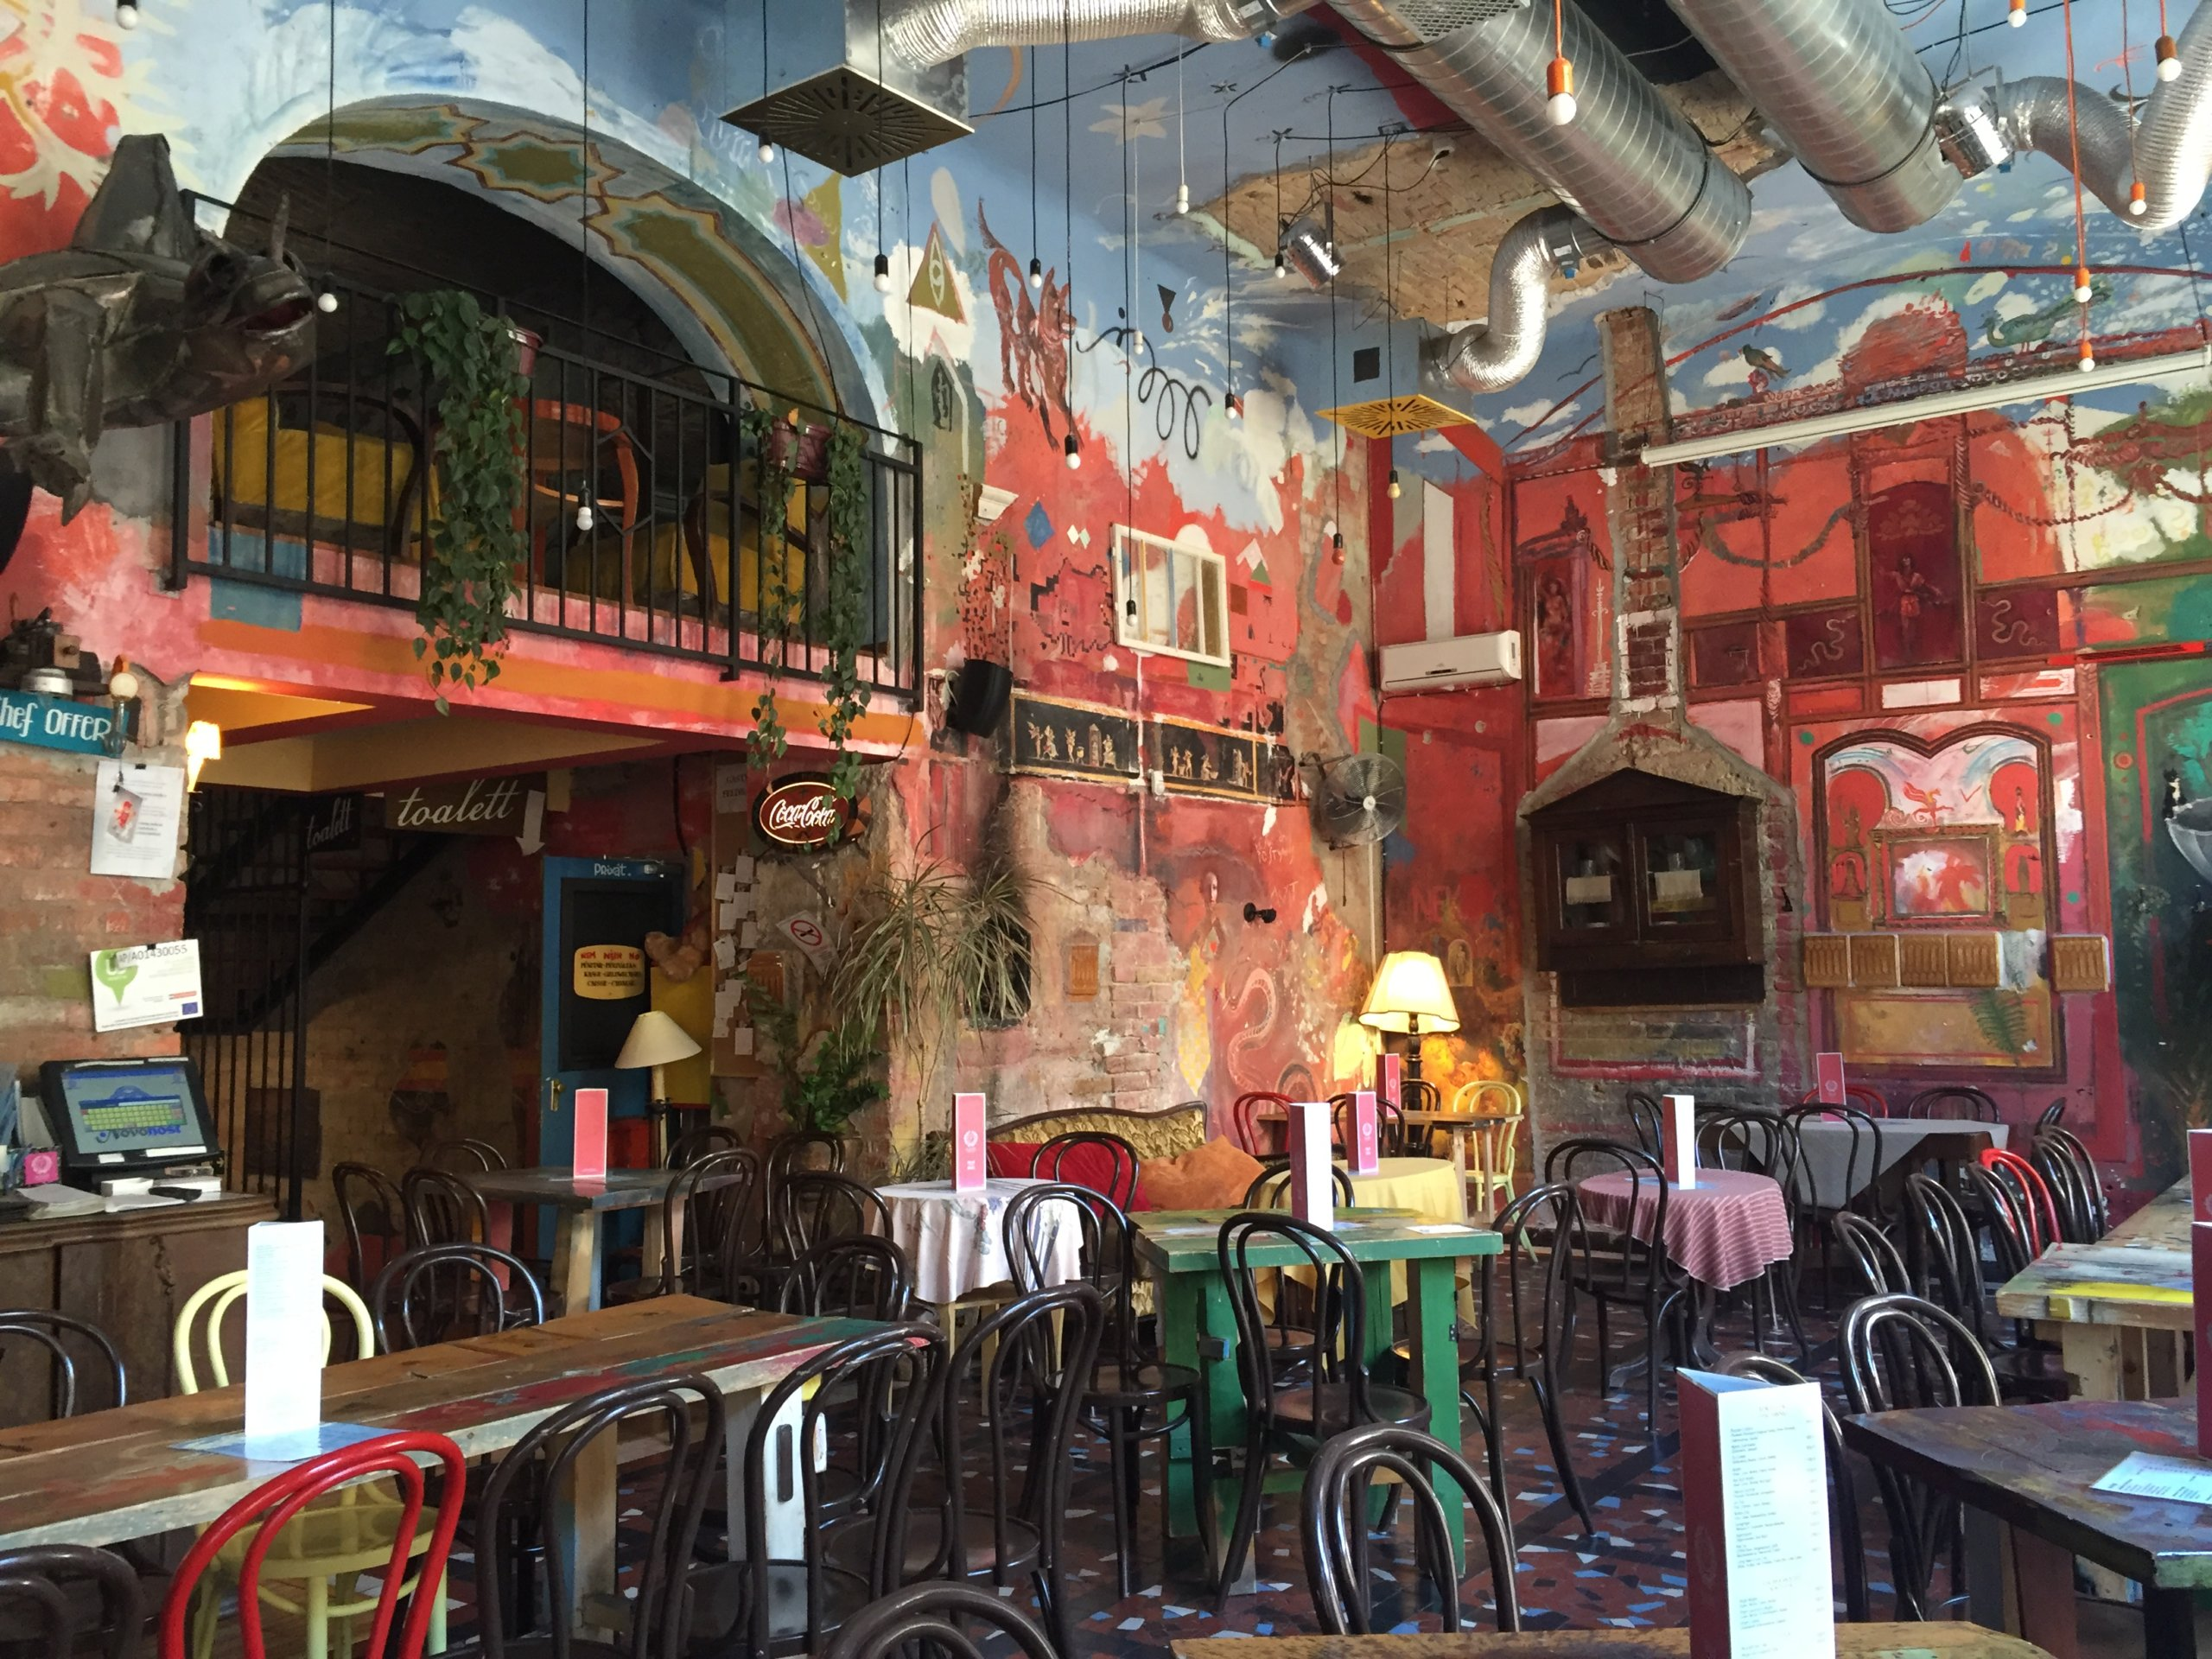 Puder ruin bar Budapest